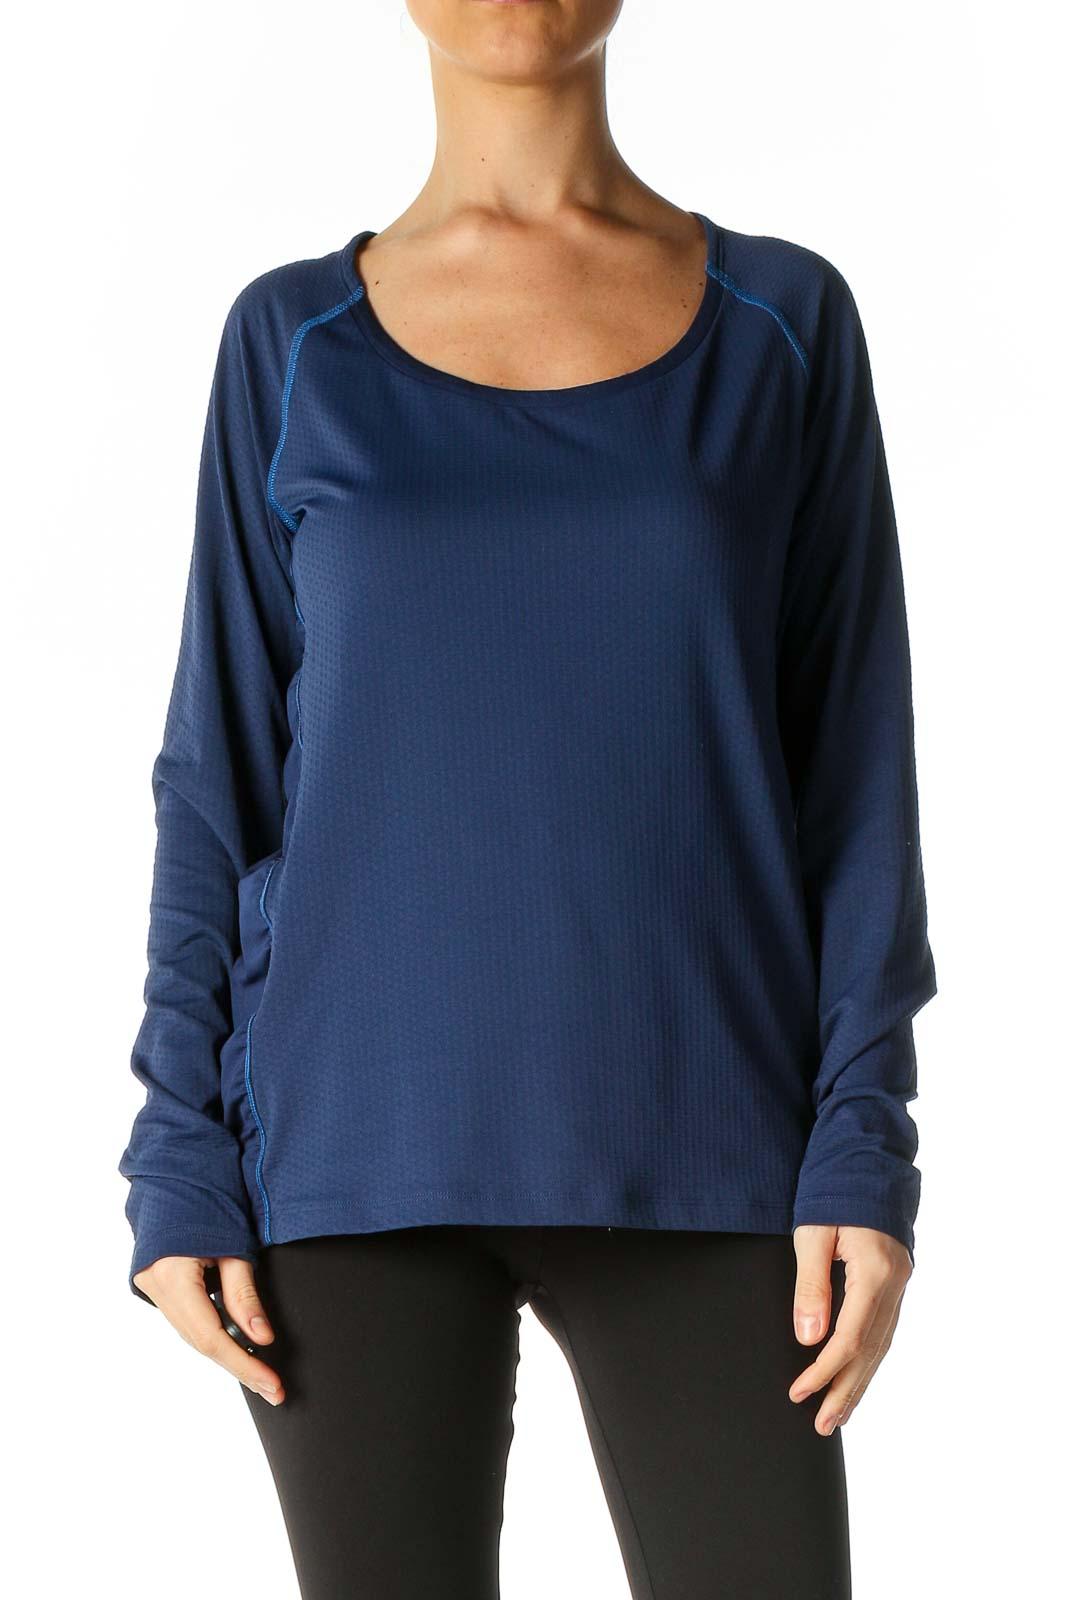 Blue Activewear Top Front